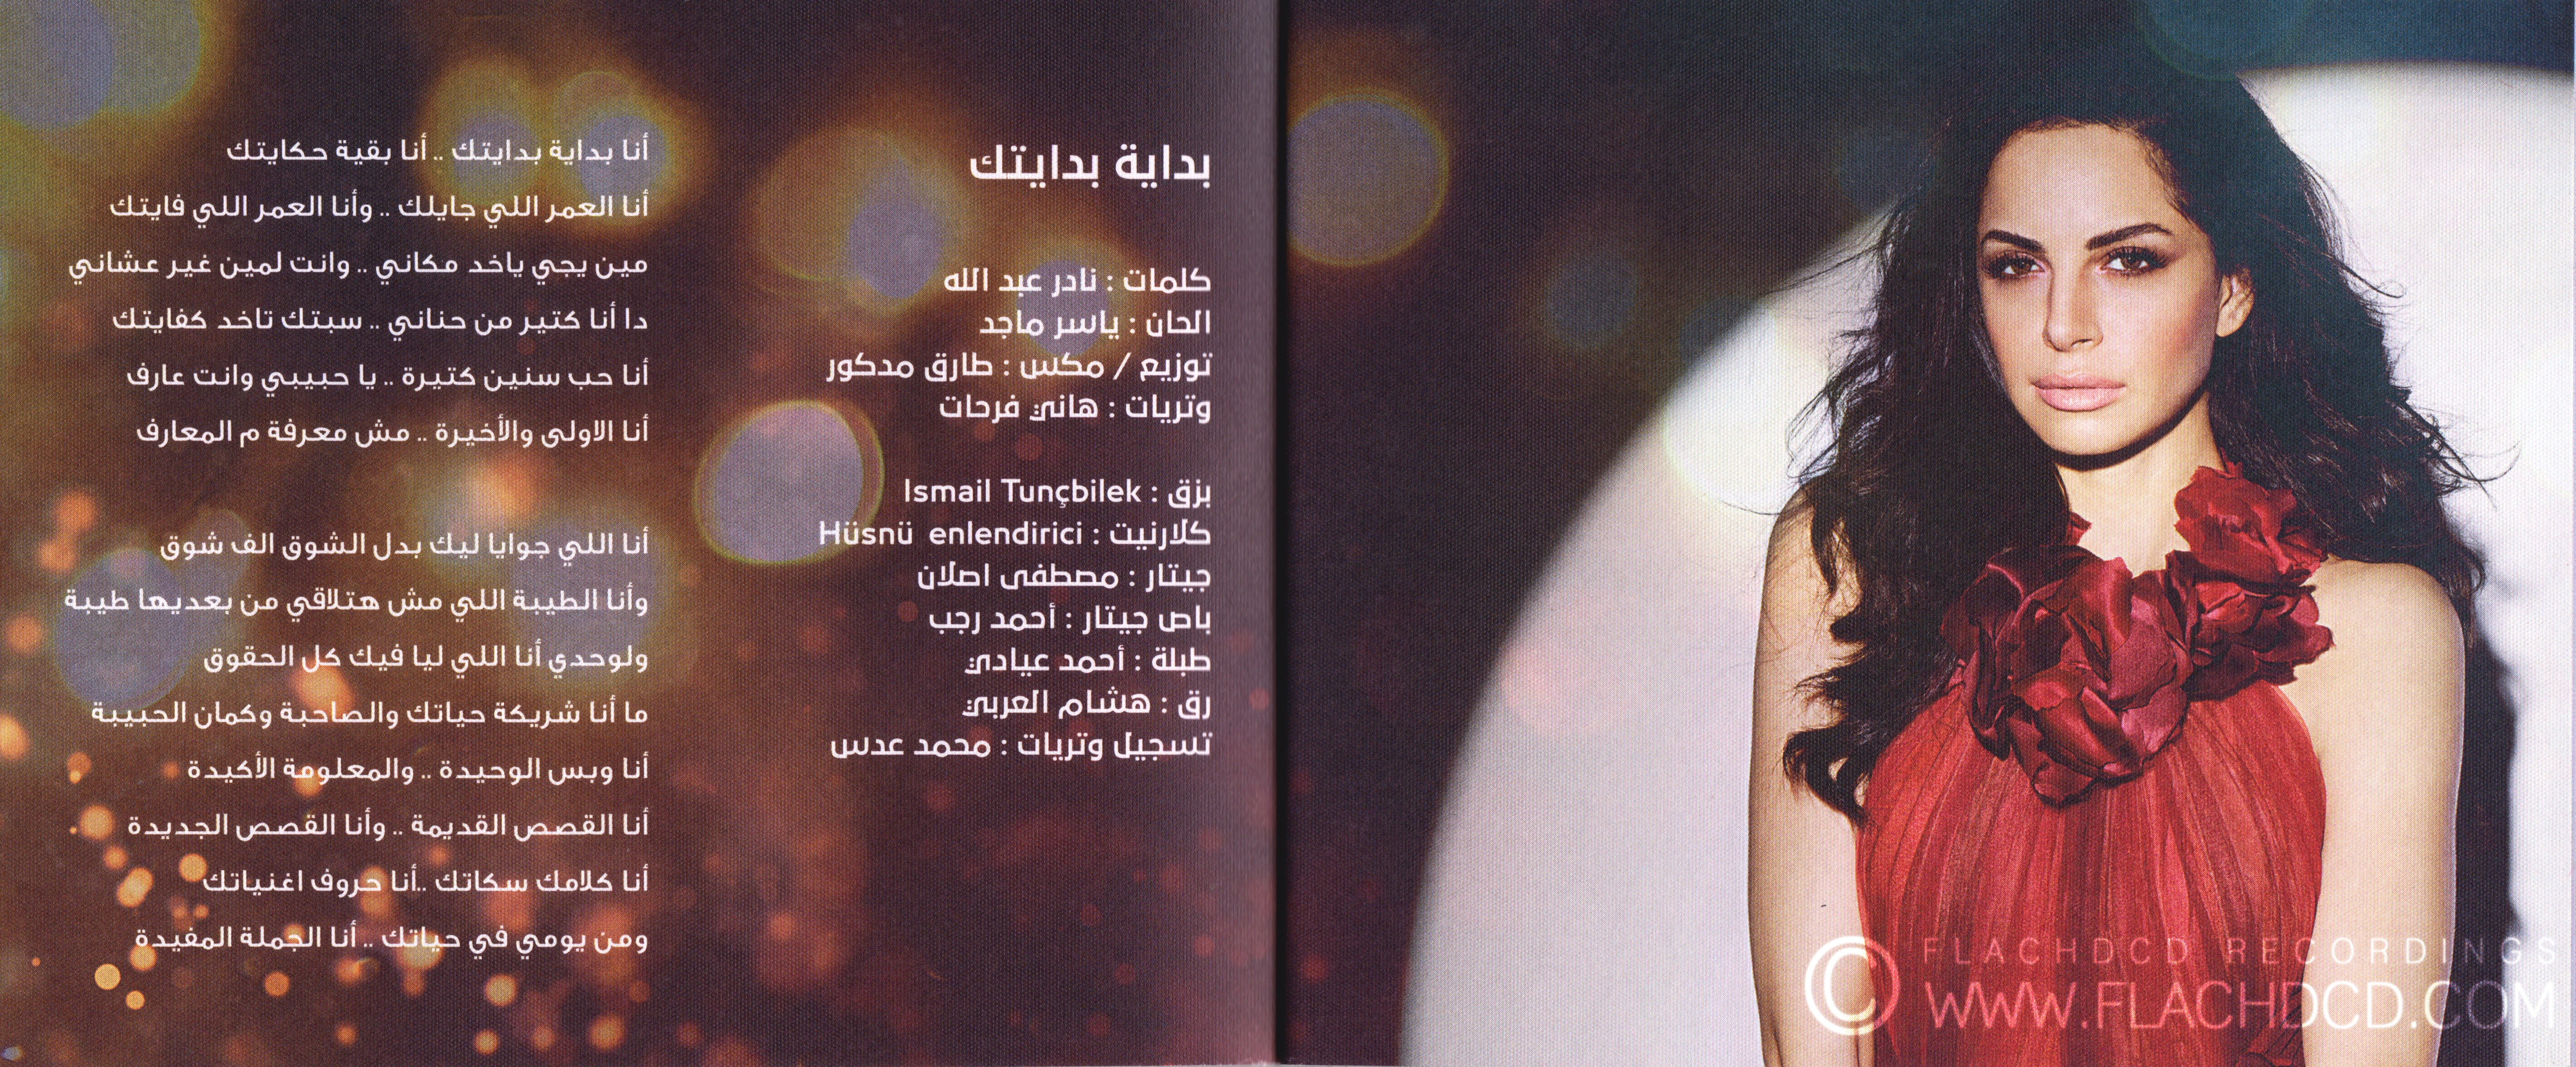 HAMAKI TÉLÉCHARGER 2011 ALBUM